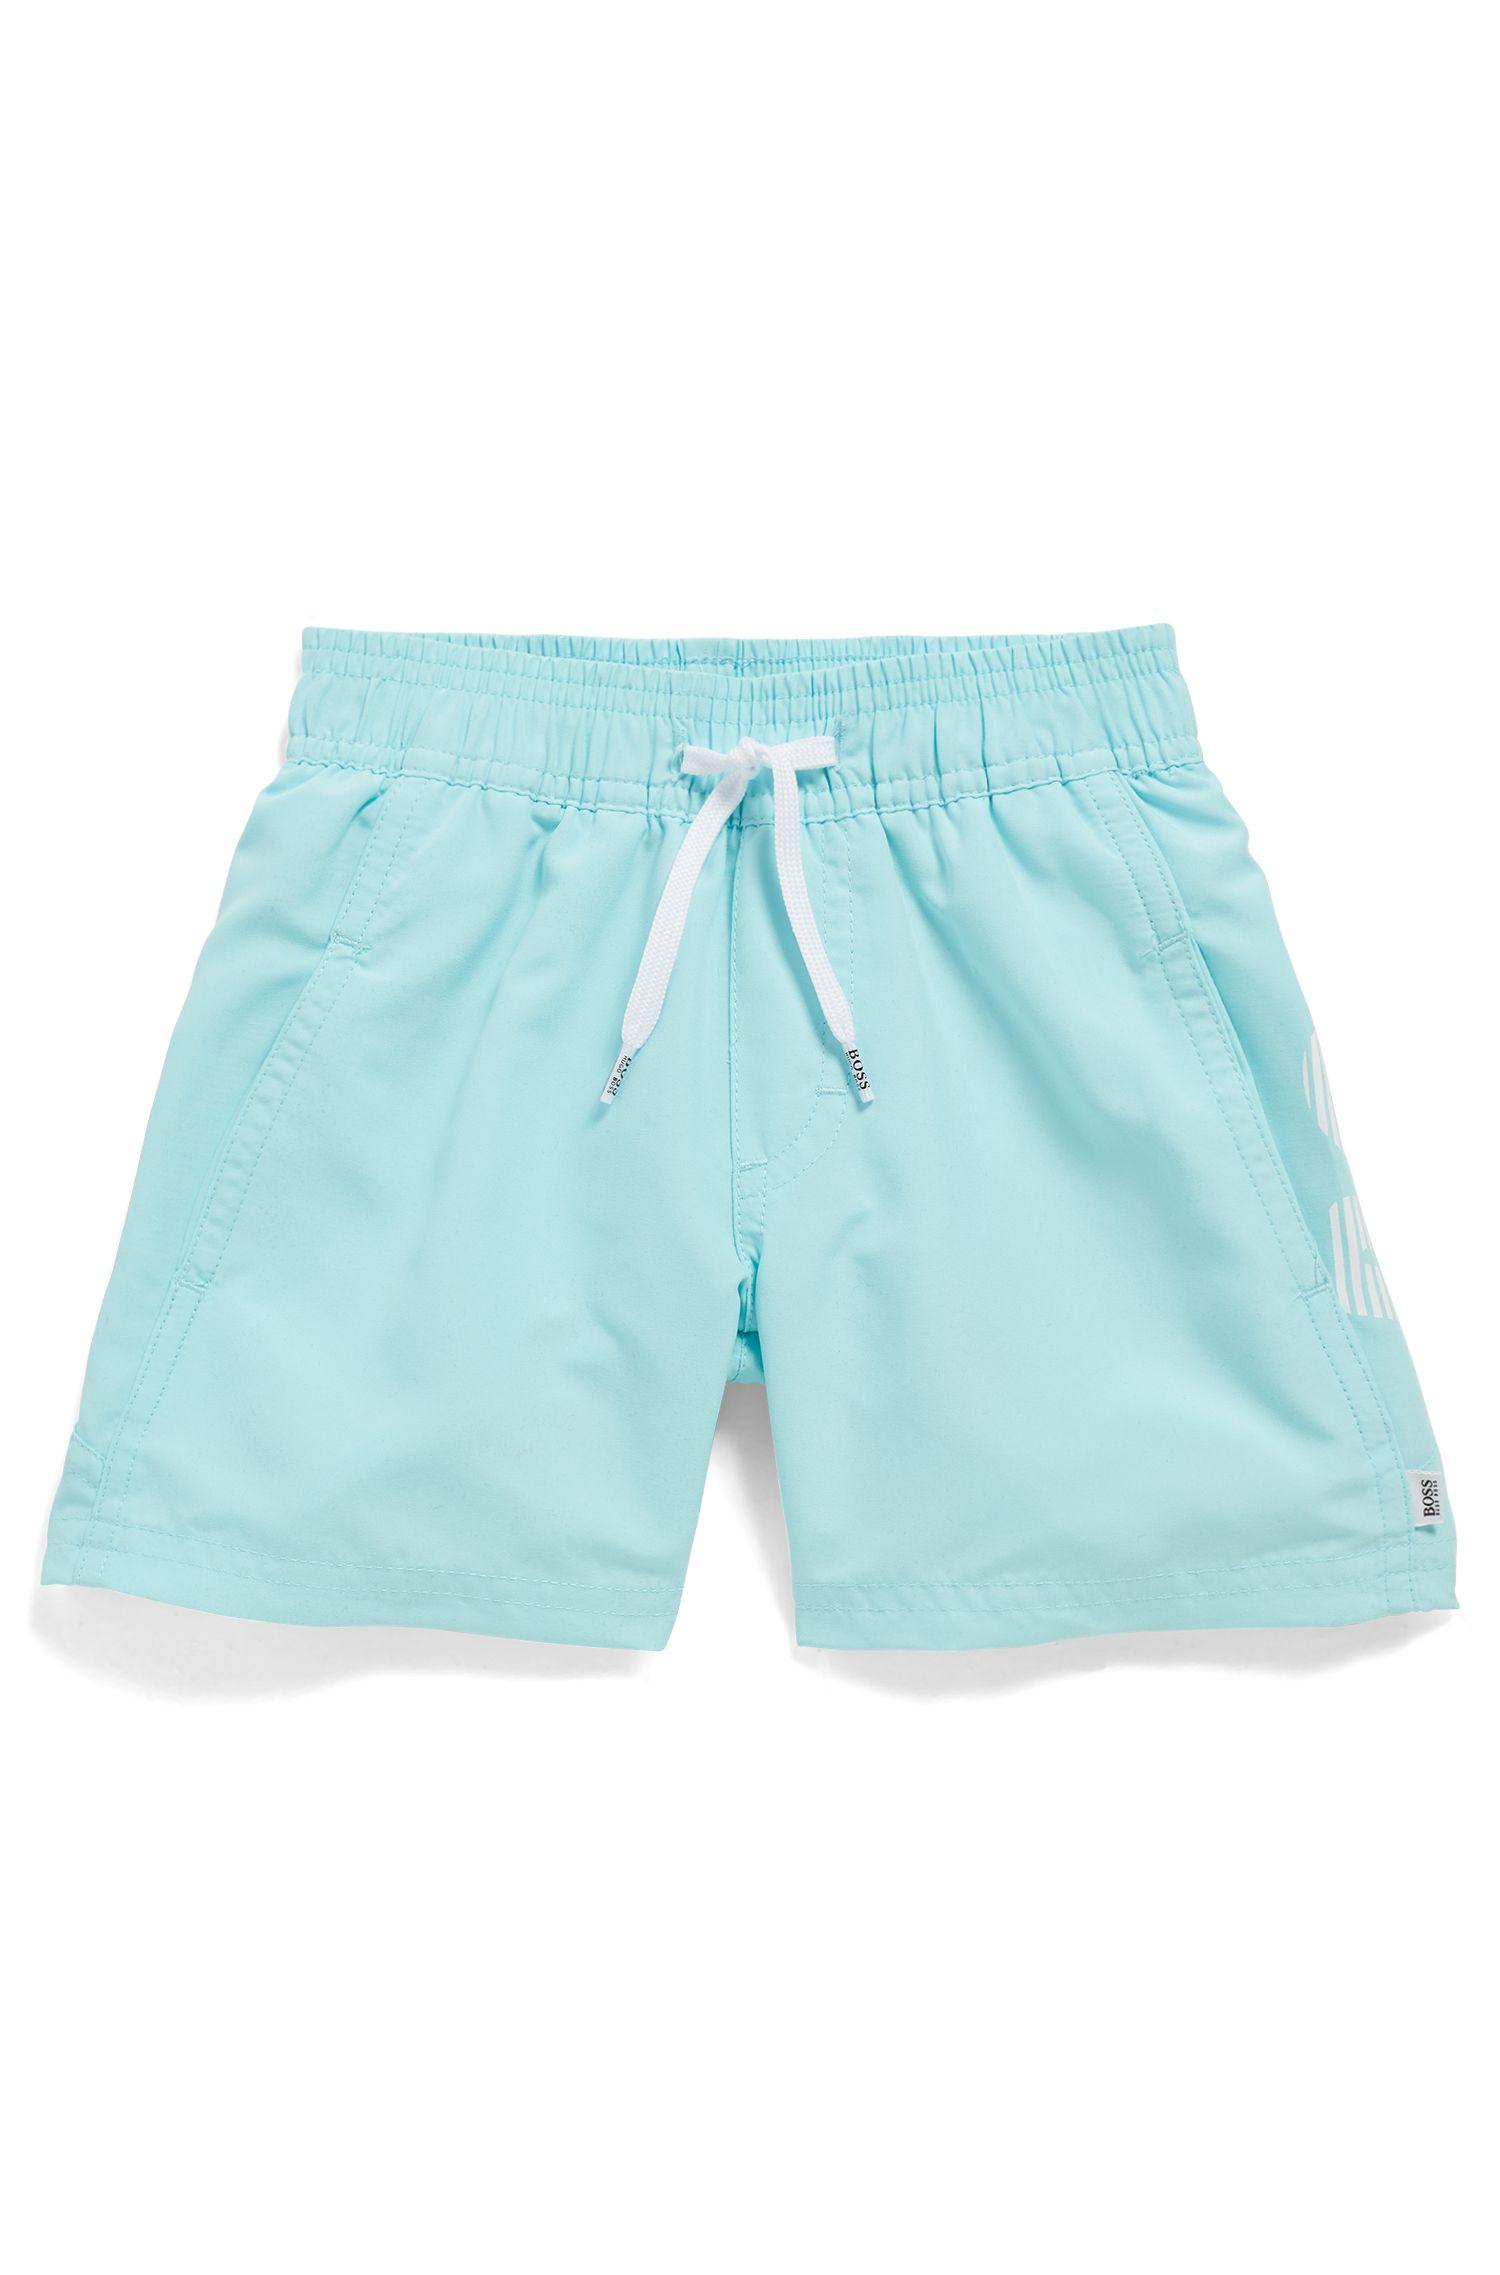 Kids' logo swim shorts in quick-dry fabric, Light Blue